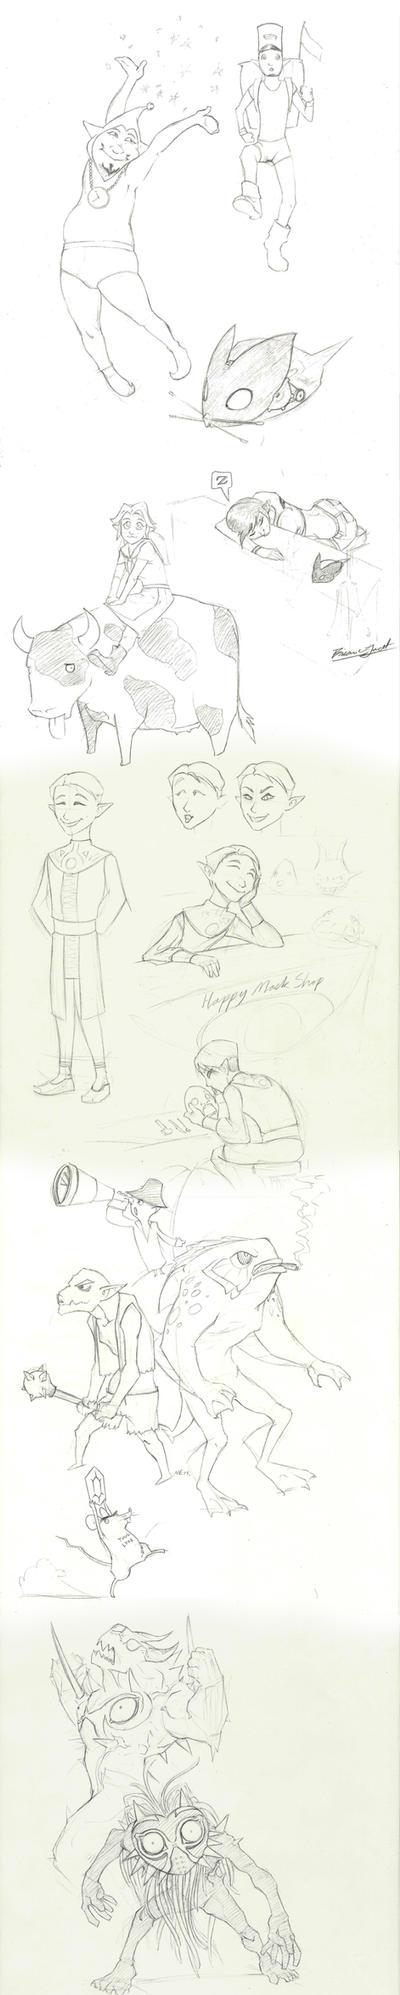 Random Zelda stuff [sketchdump] by Bri-Dude